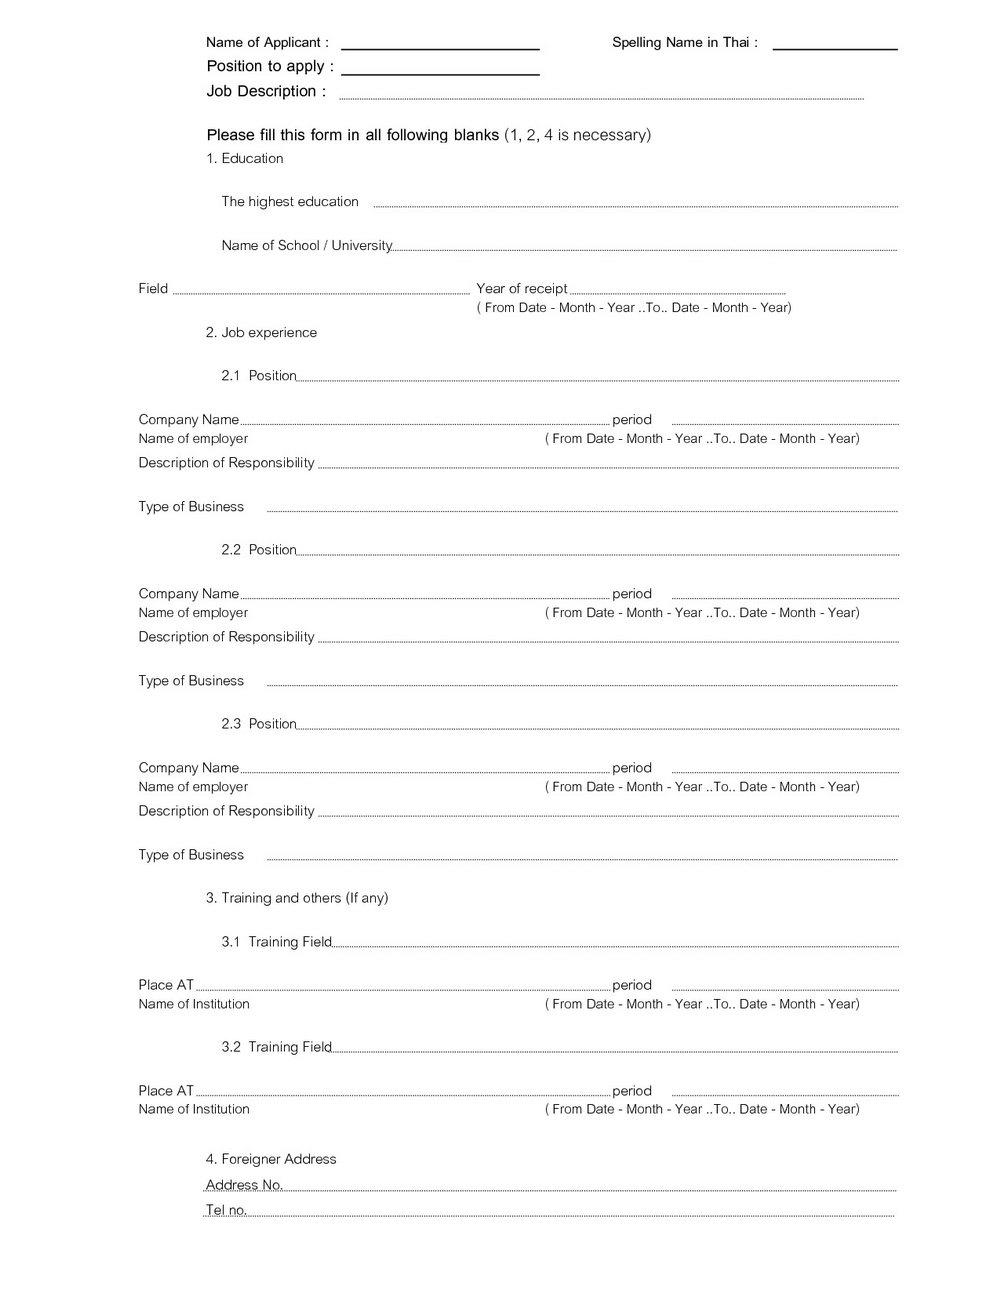 Free Printable Blank Resume Forms